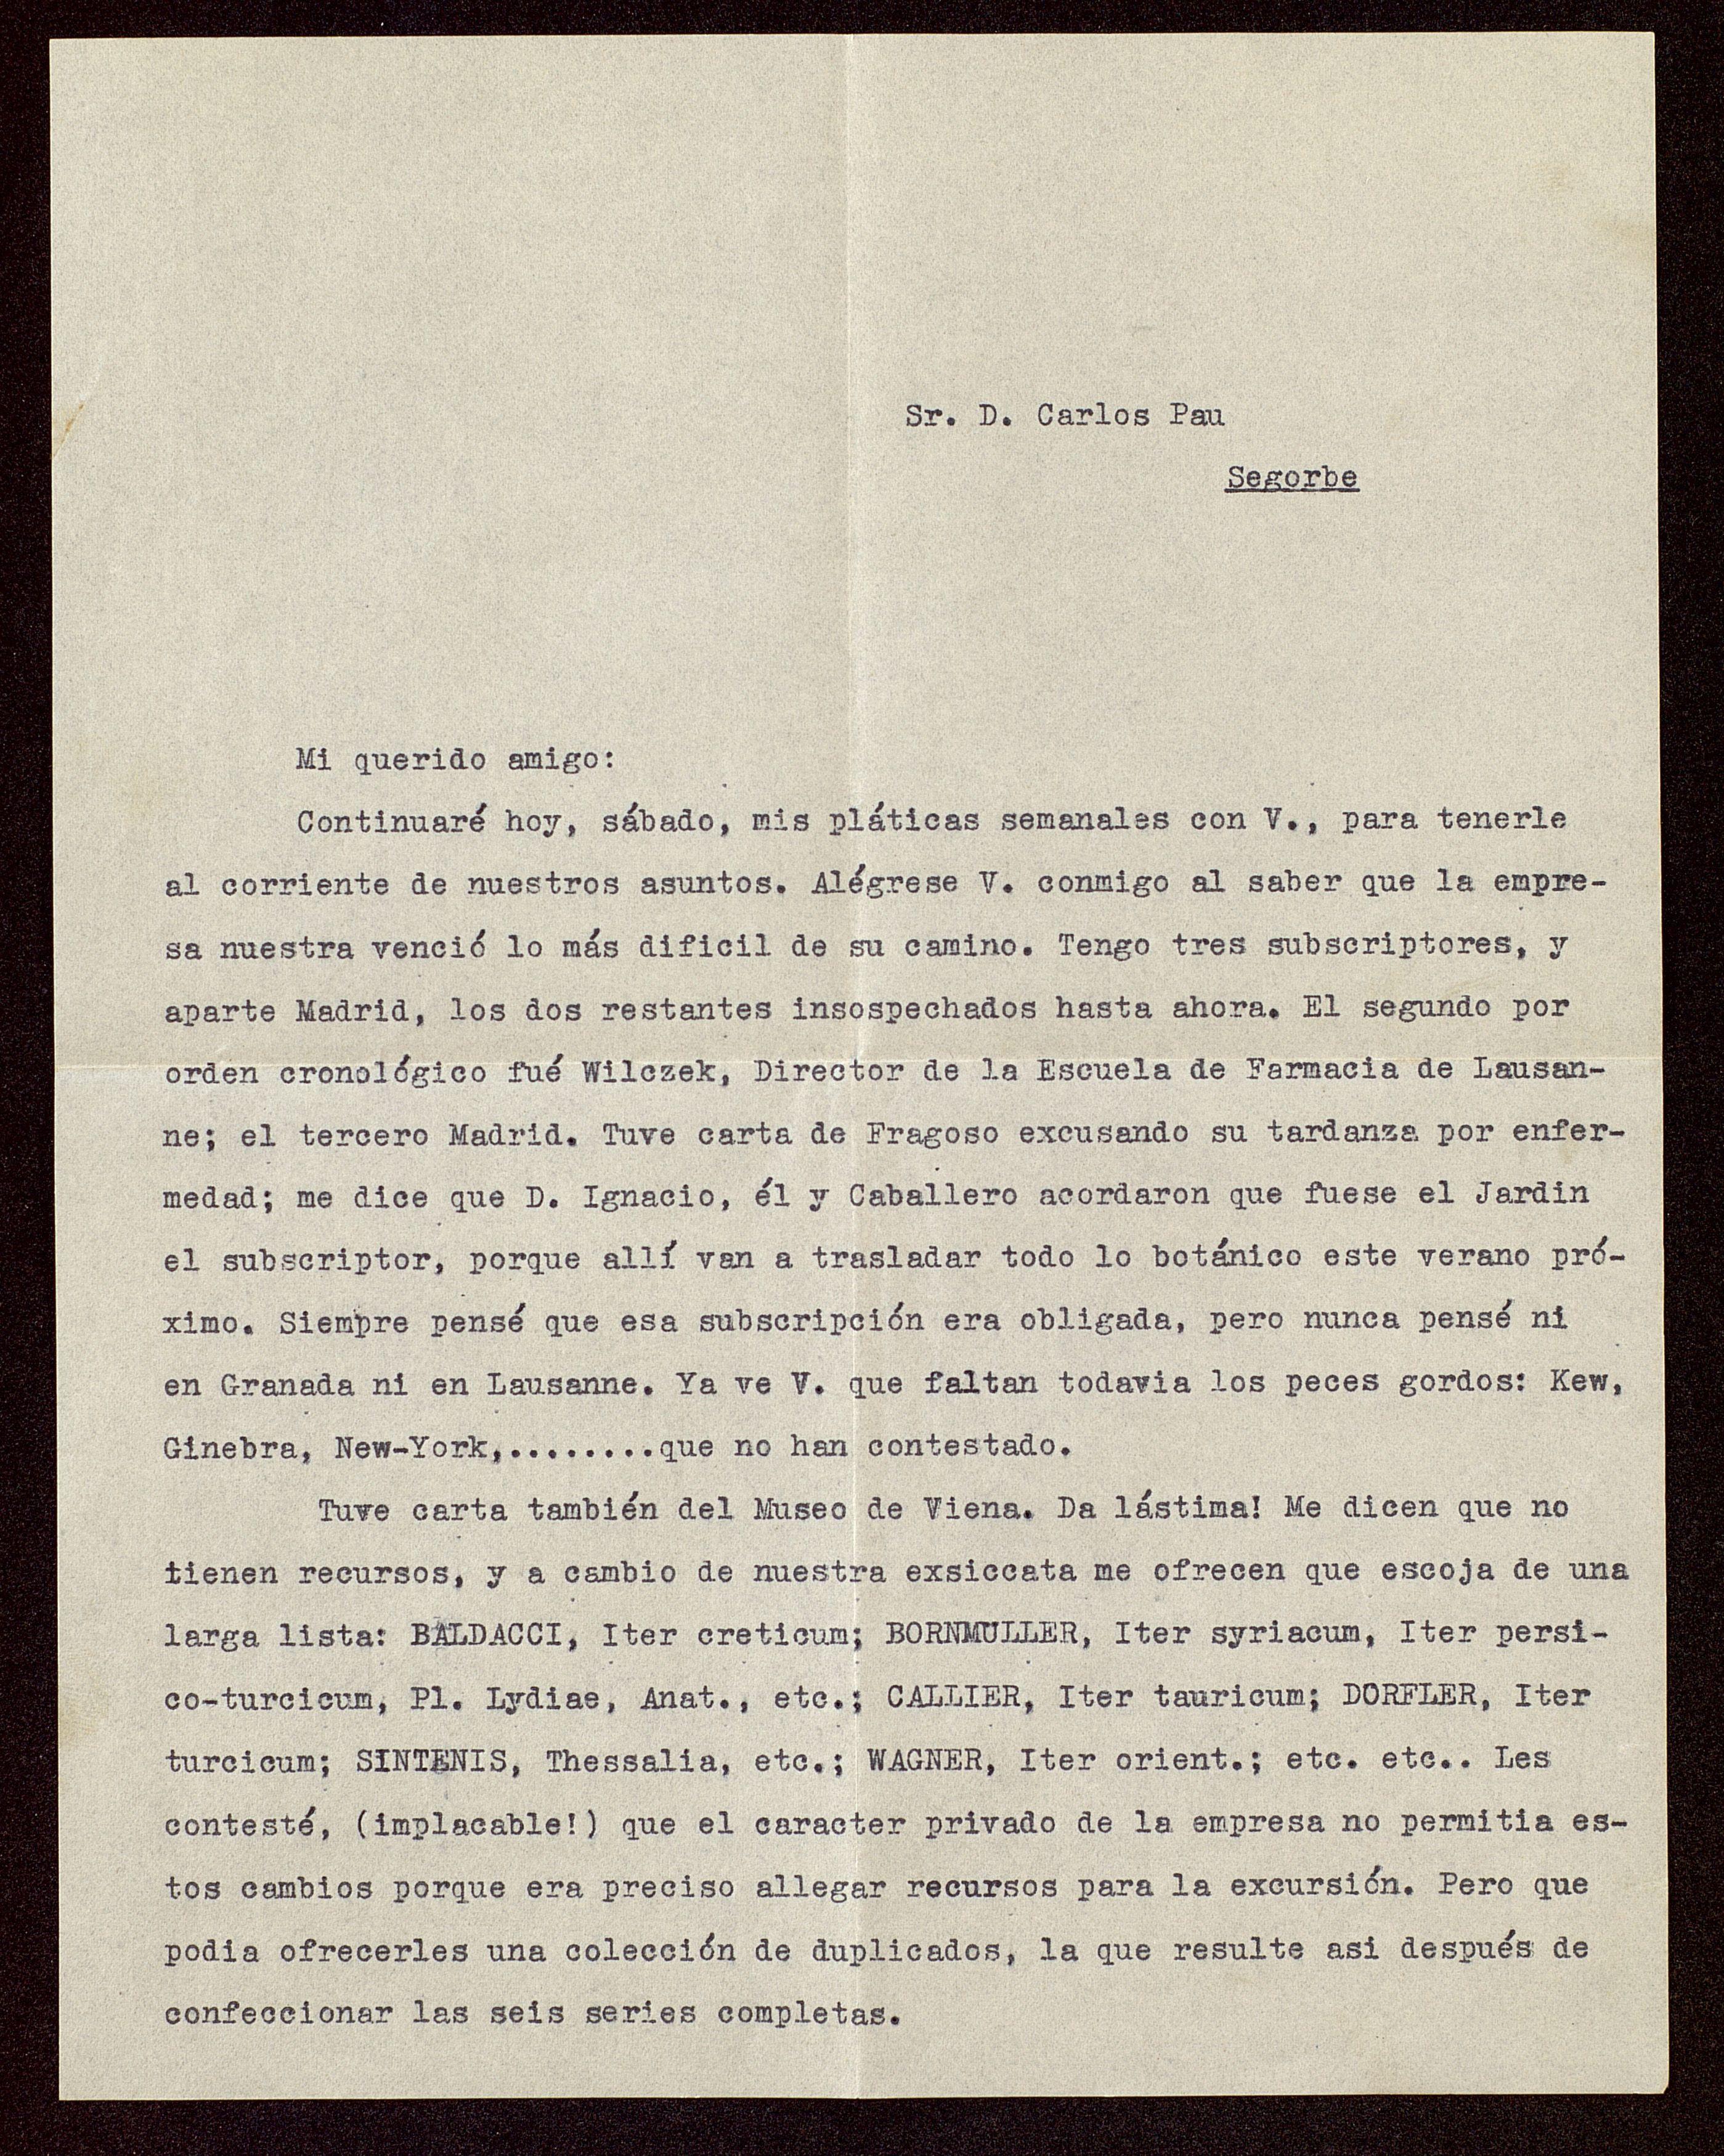 "Instituciones científicas que se suscribieron a la exiccata ""Iter Maroccanum"", Barcelona  19/02/1927. http://aleph.csic.es/F?func=find-c&ccl_term=SYS%3D000032841&local_base=ARCHIVOS (AIBB)"